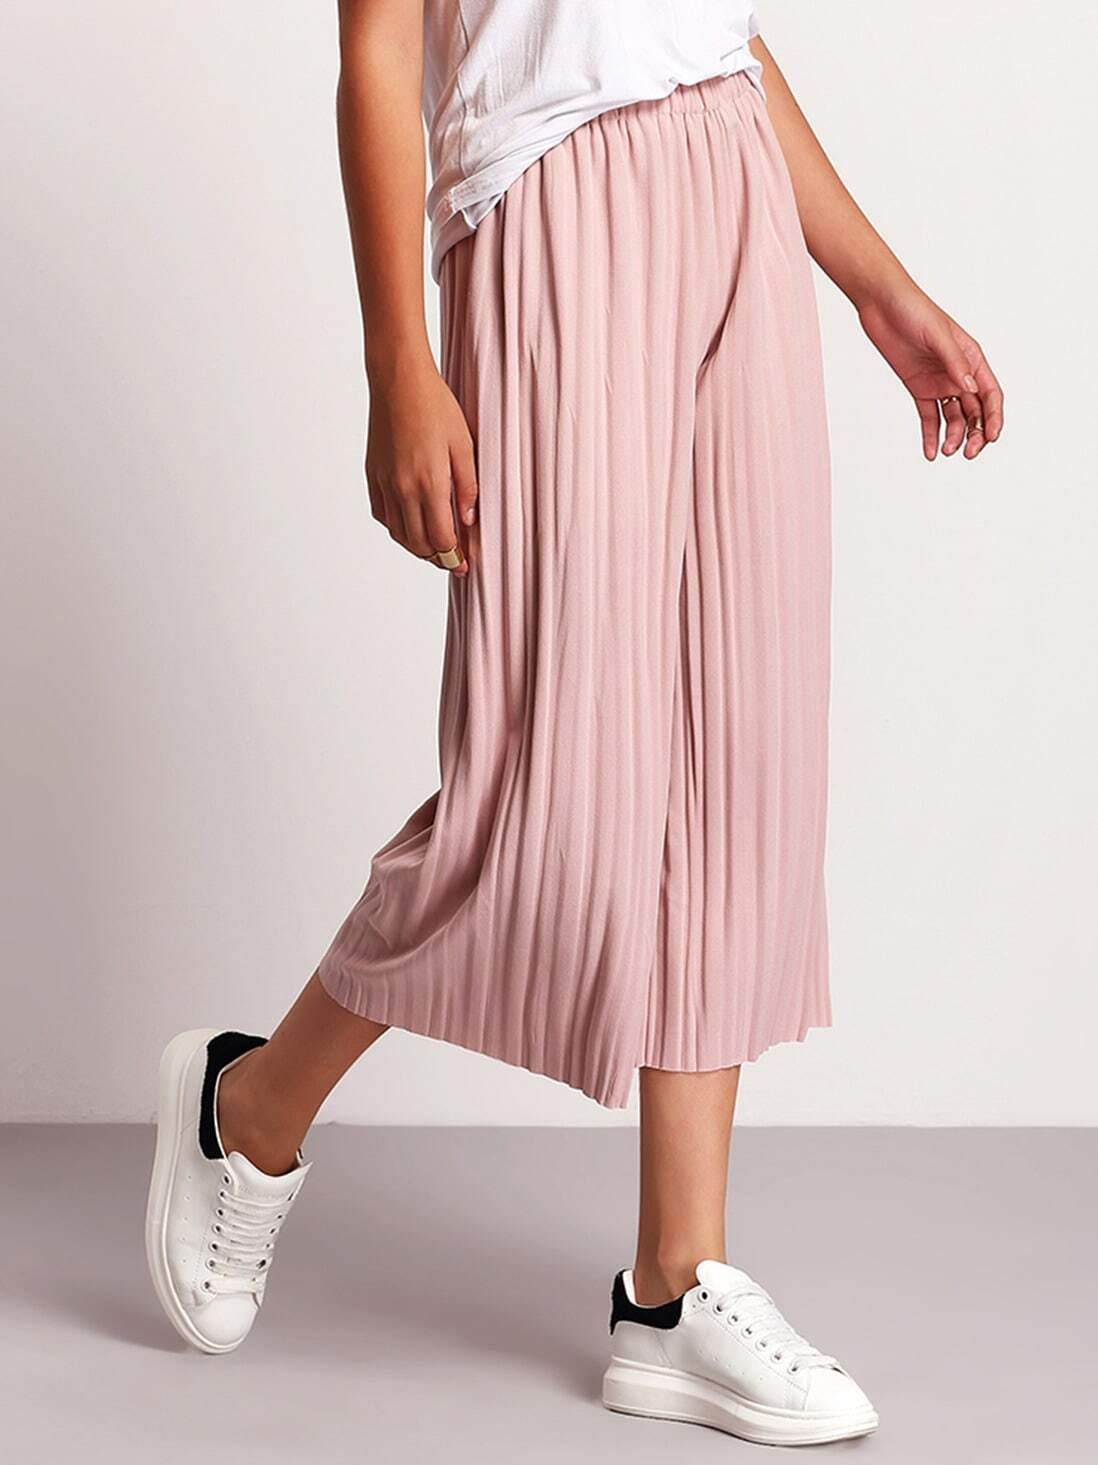 1f0399ece1 Pink Elastic Waist Pleated Pant EmmaCloth-Women Fast Fashion Online